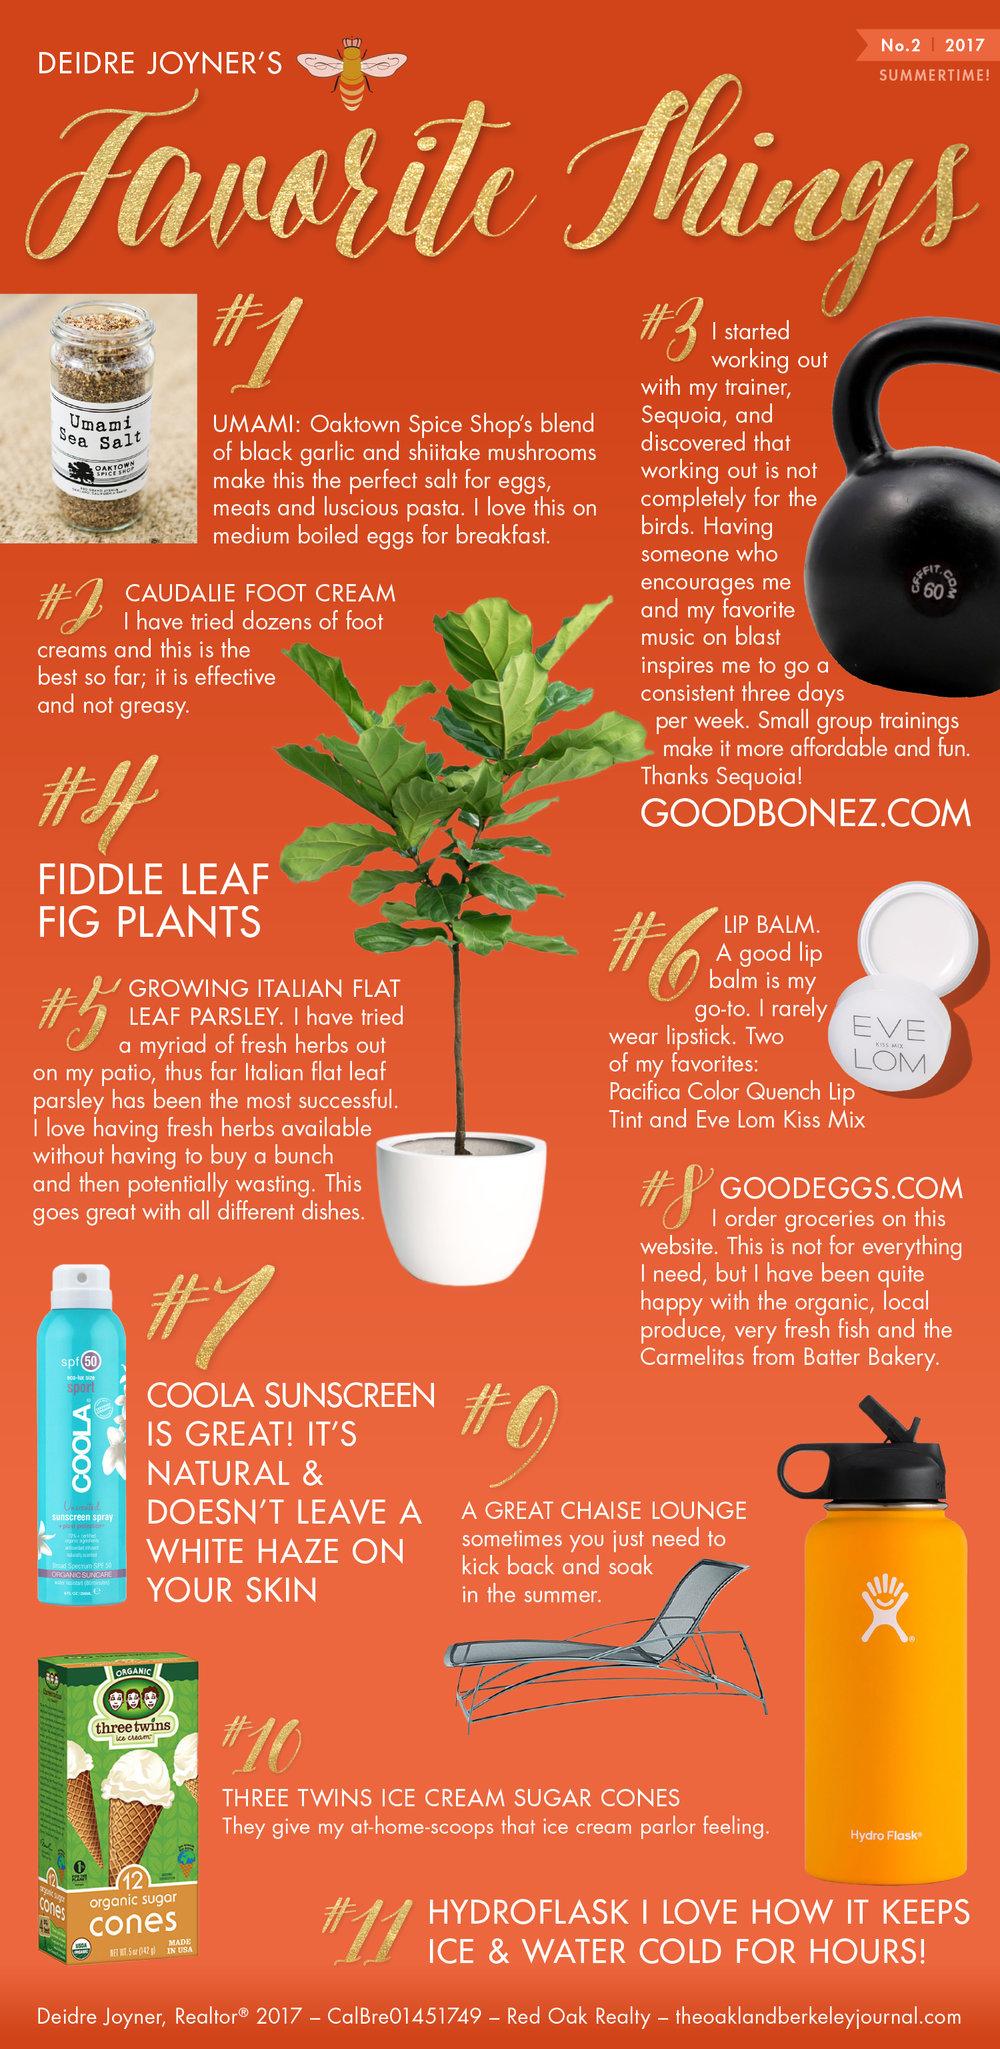 TheOaklandBerkeleyJournal.com : Deidre Joyner : Favorite Things No. 2